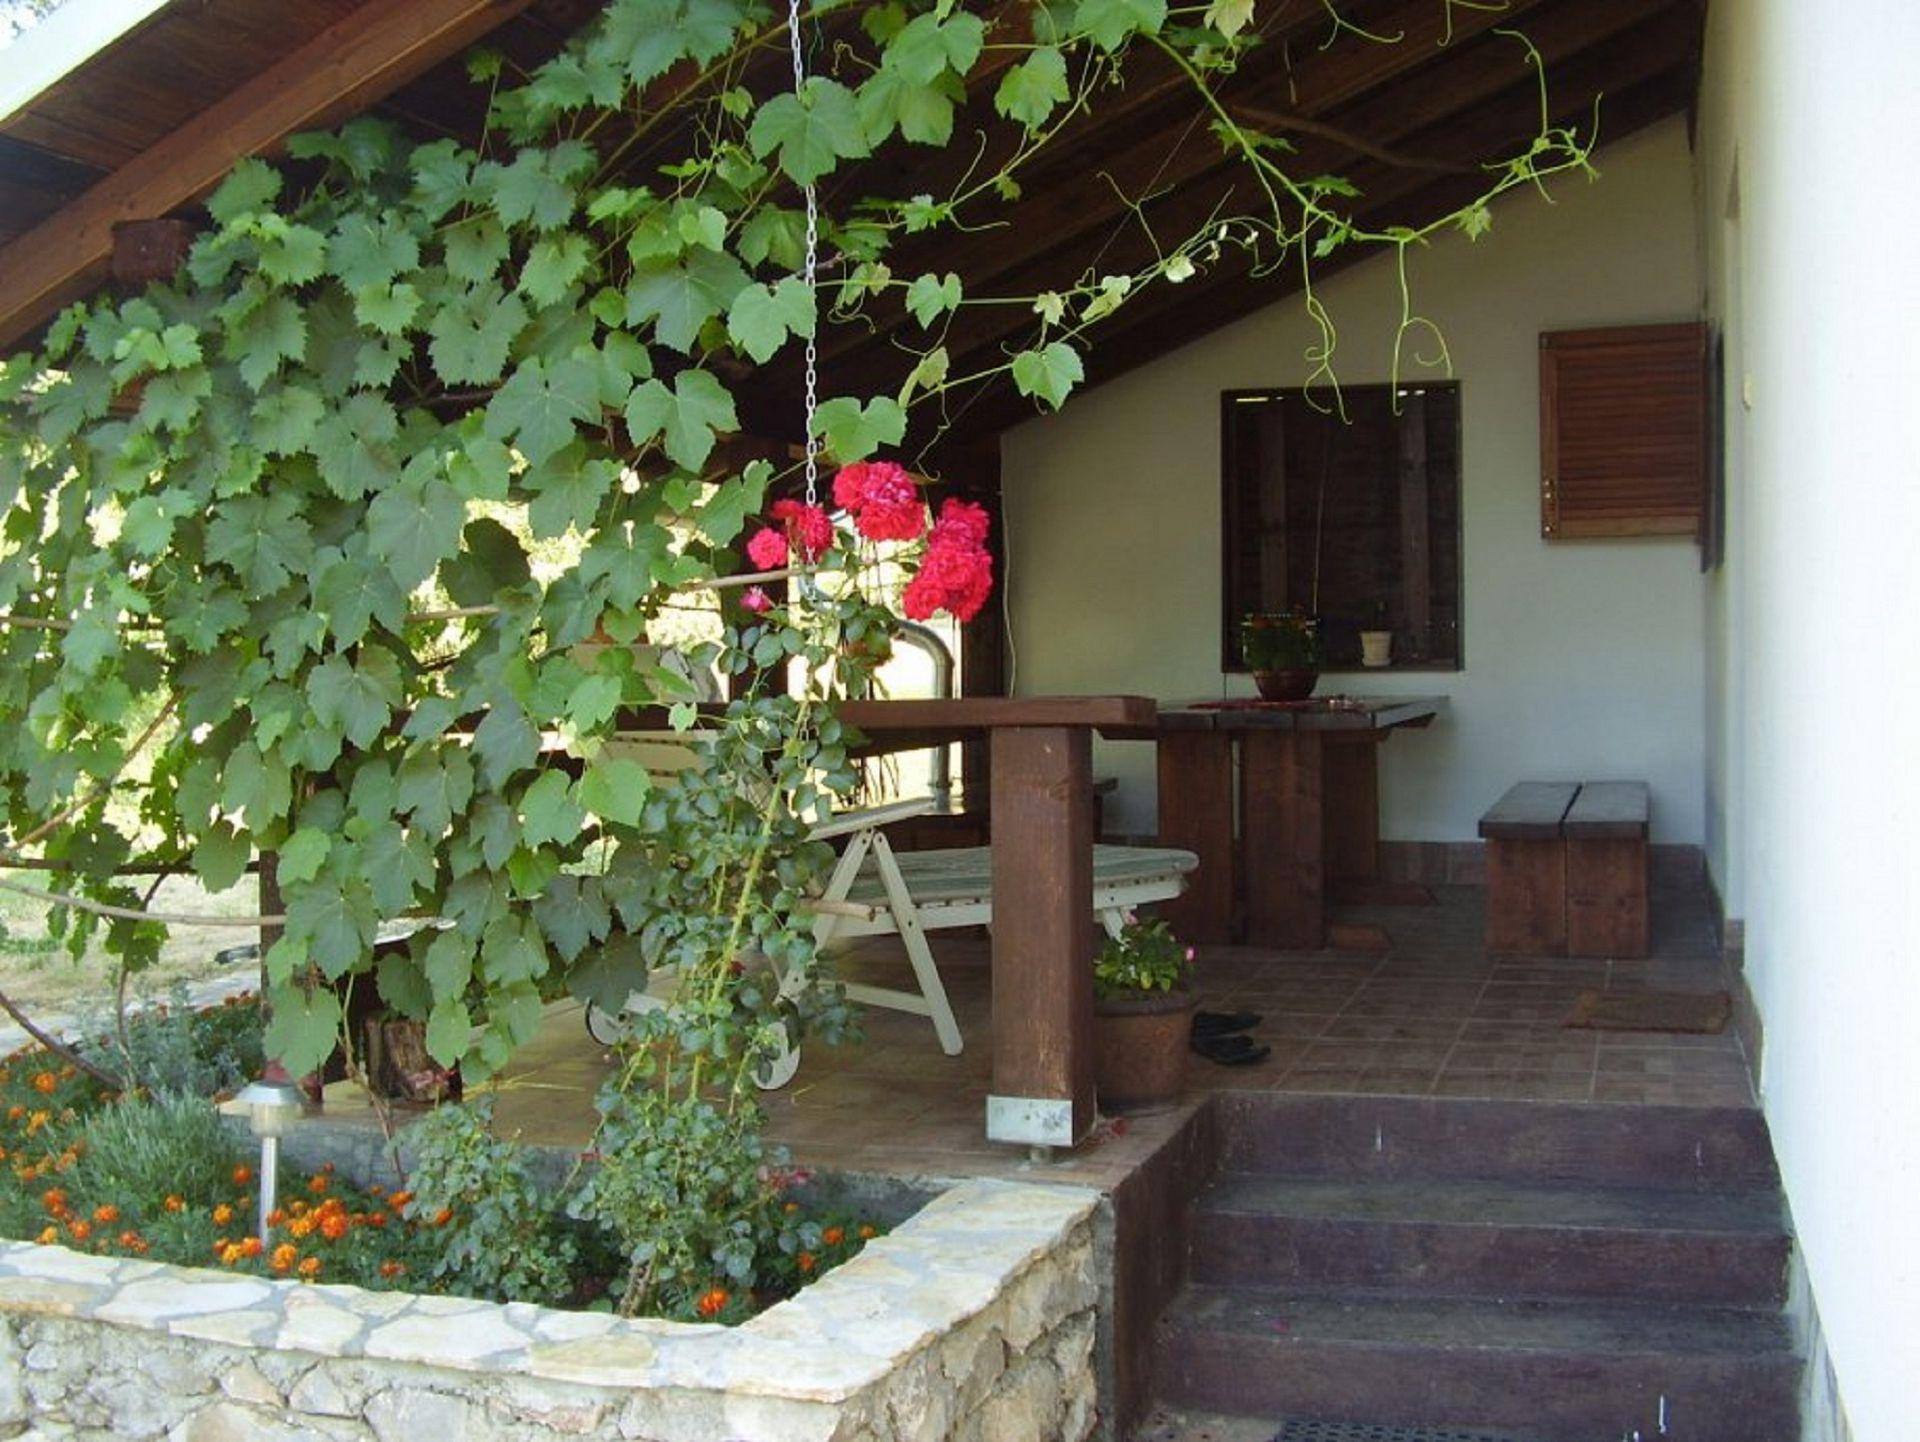 Biserka - Gacka dolina - Maisons de repos, villas Croatie - H(4+2): terrasse